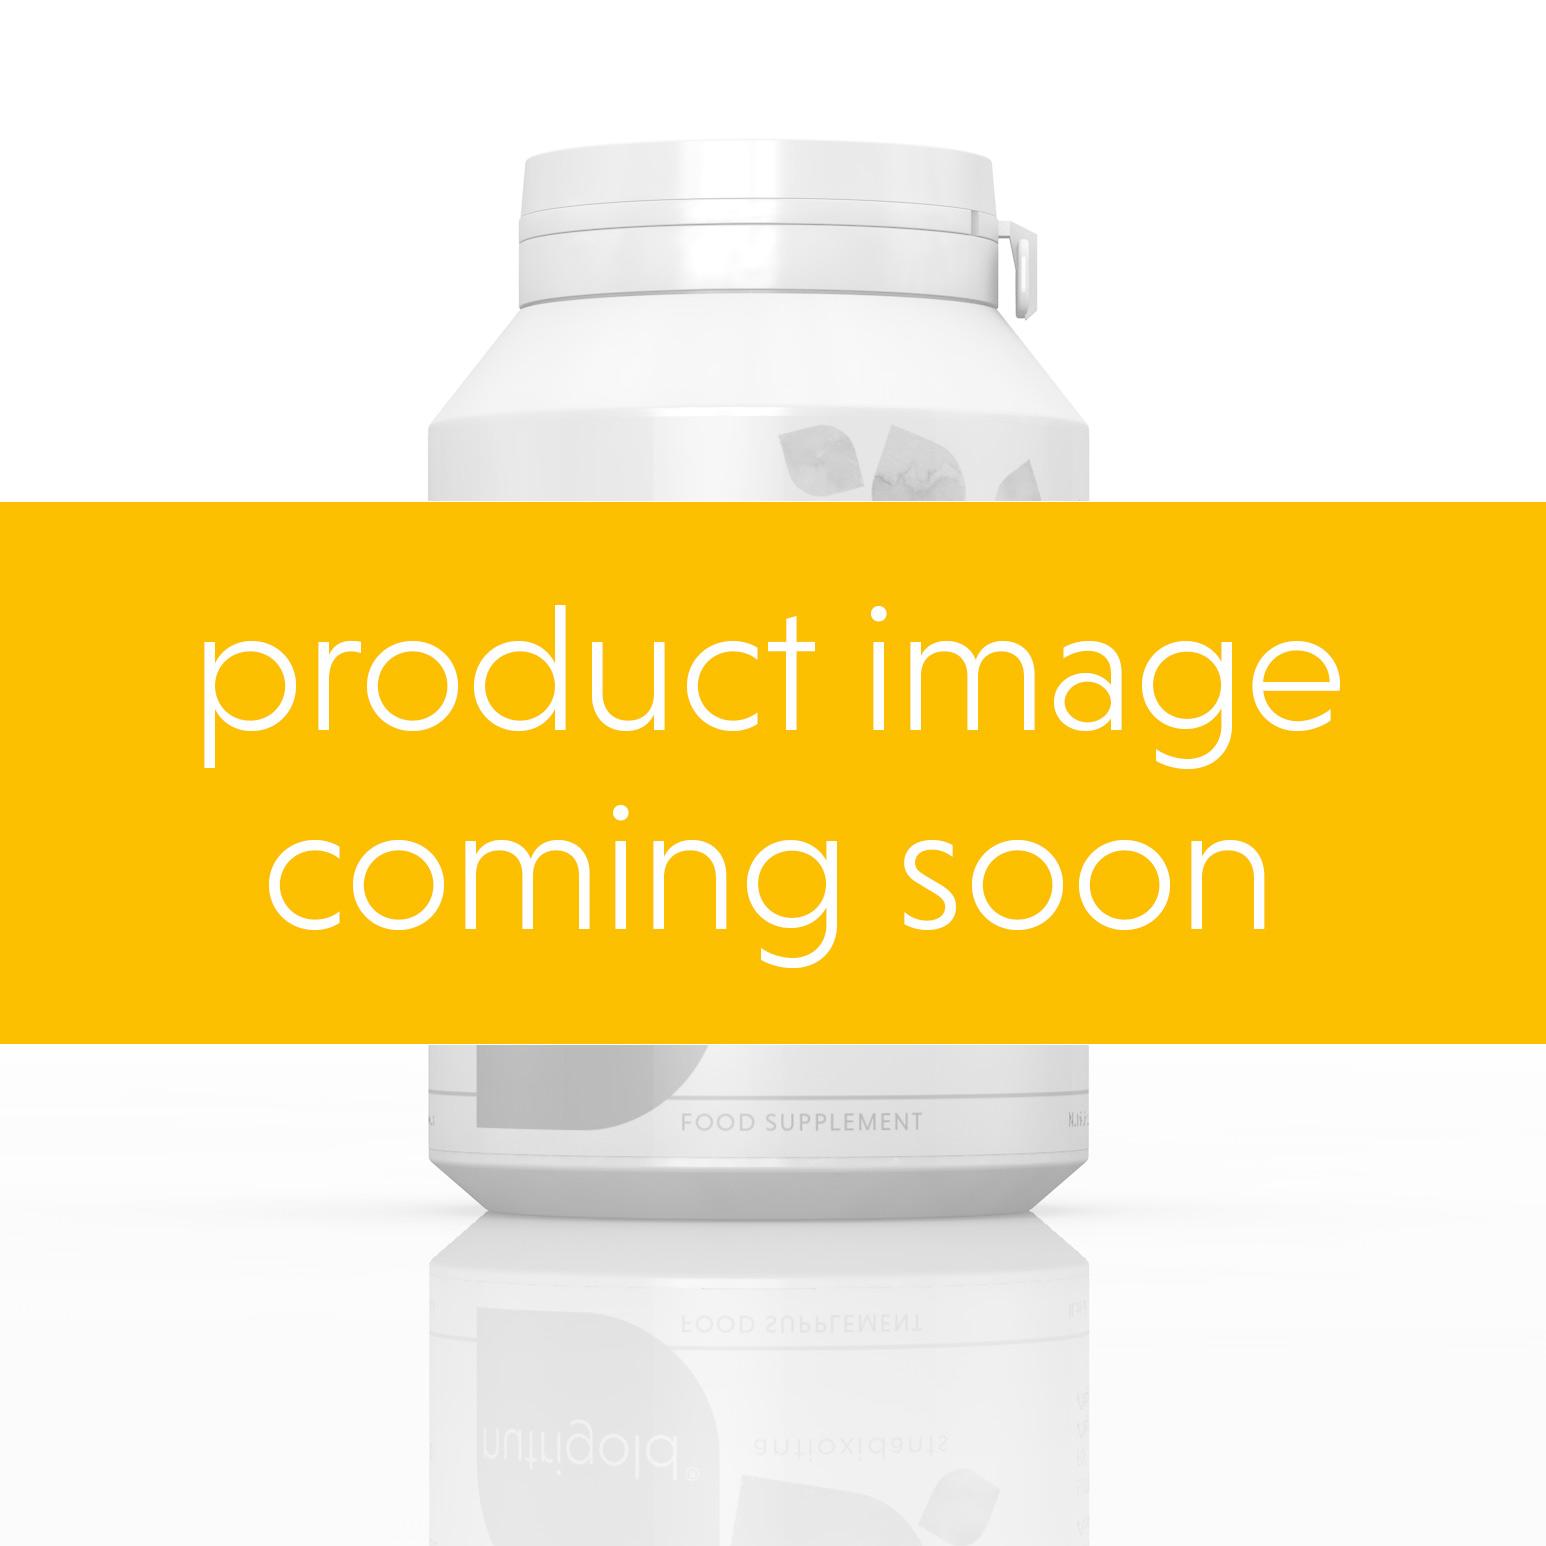 Vitamin C with Citrus Bioflavonoids x 120 Tablets